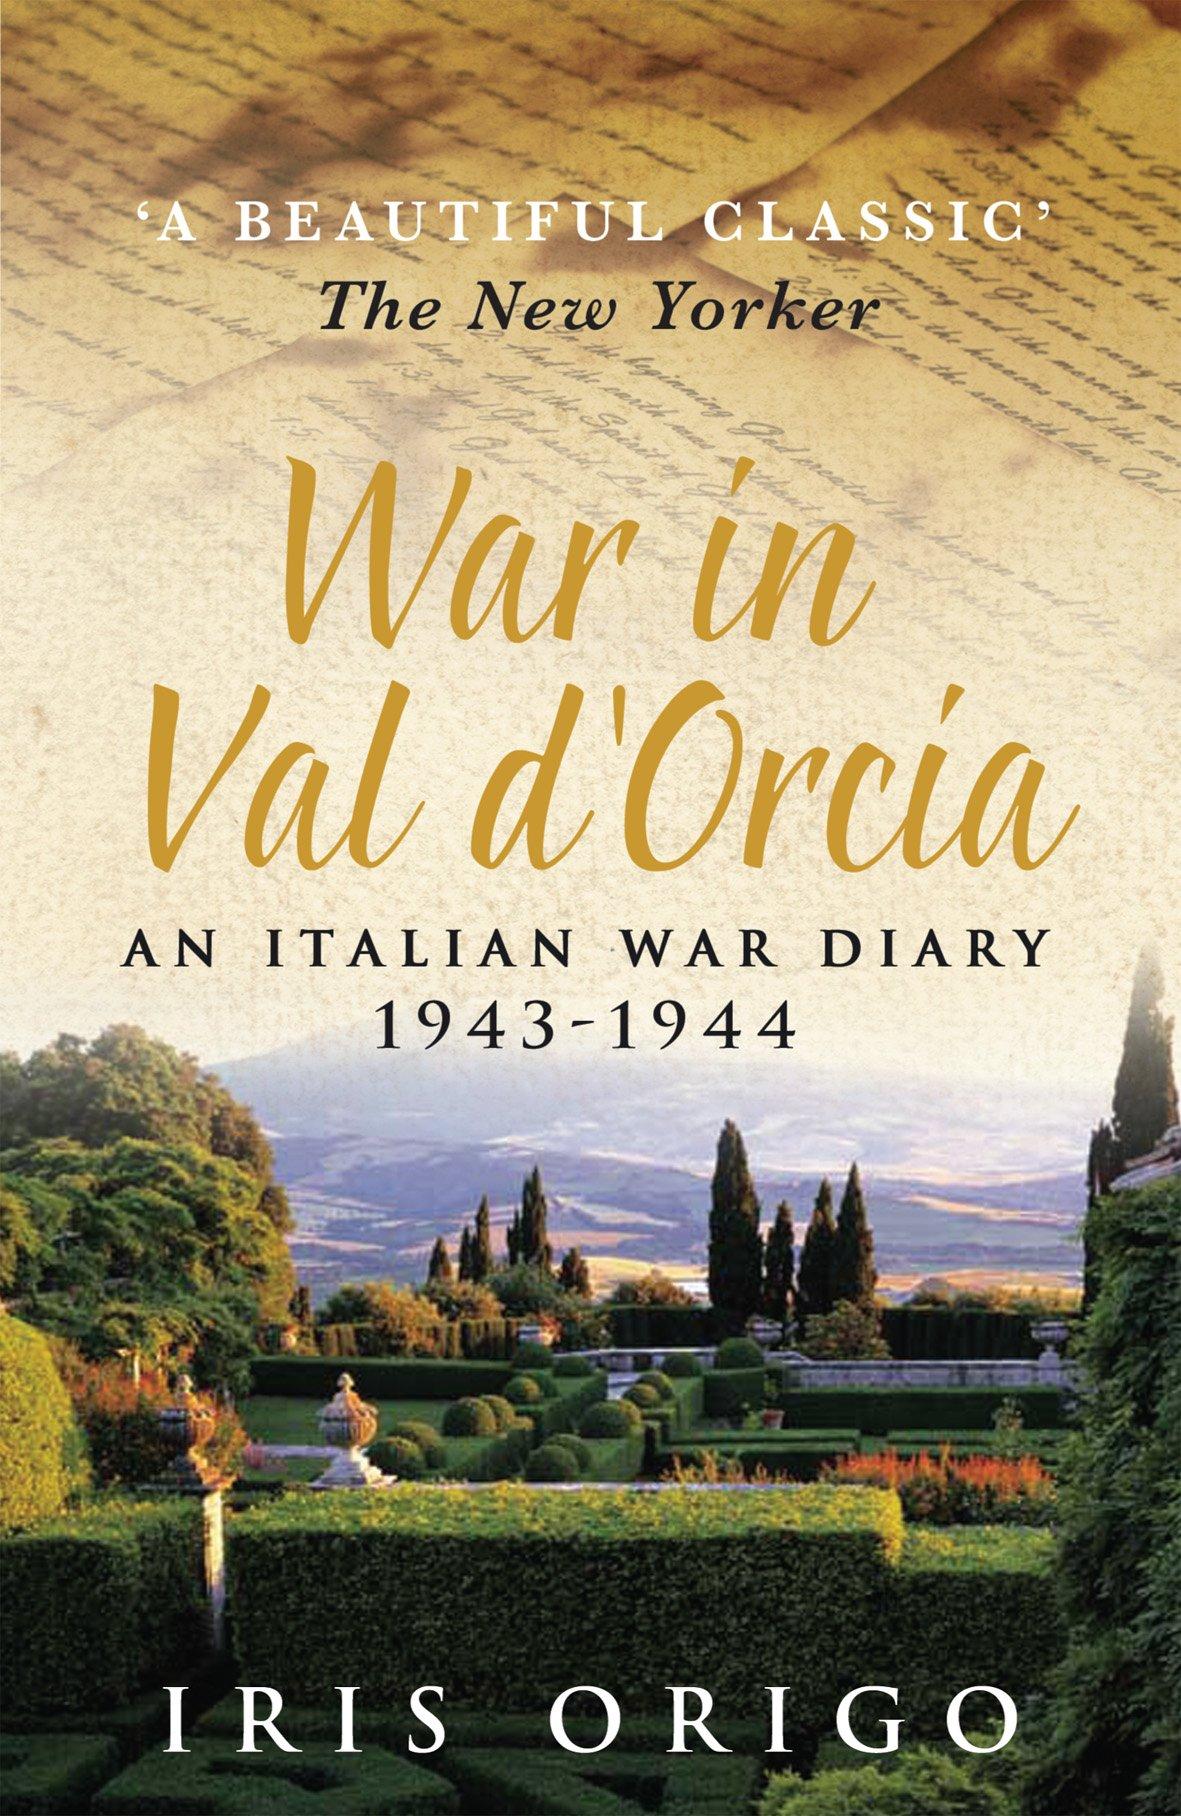 War in Val d'Orcia. An Italian war diary 1943-44: An Italian War Diary,  1943-1944: Amazon.co.uk: Iris Origo, Denis Mack Smith: 9780749004231: Books